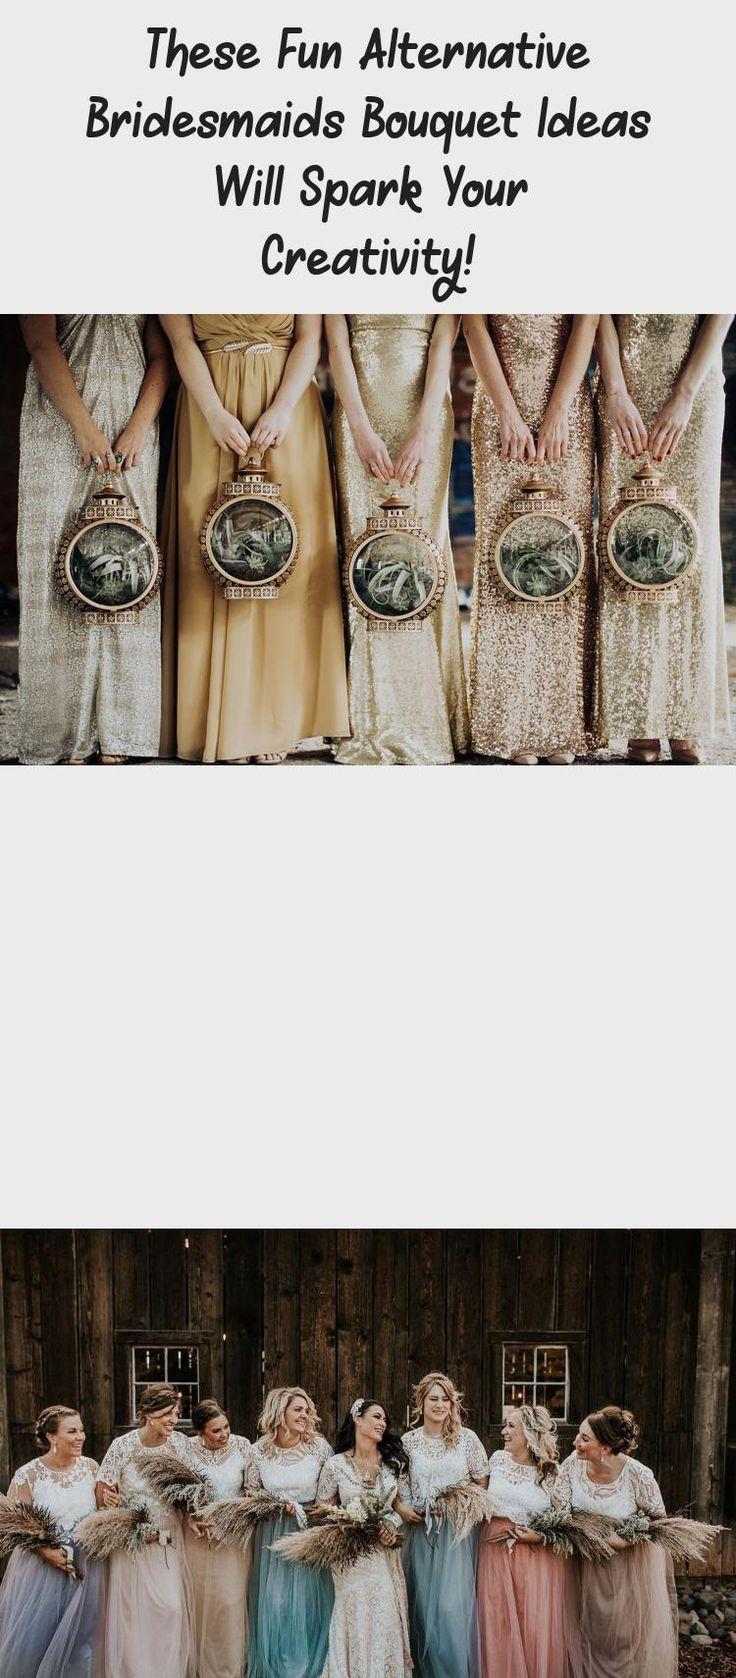 These Fun Alternative Bridesmaids Bouquet Ideas Will Spark Your Creativity! - Green Wedding Shoes #GrayBridesmaidDresses #SimpleBridesmaidDresses #CasualBridesmaidDresses #BridesmaidDressesSummer #SageBridesmaidDresses